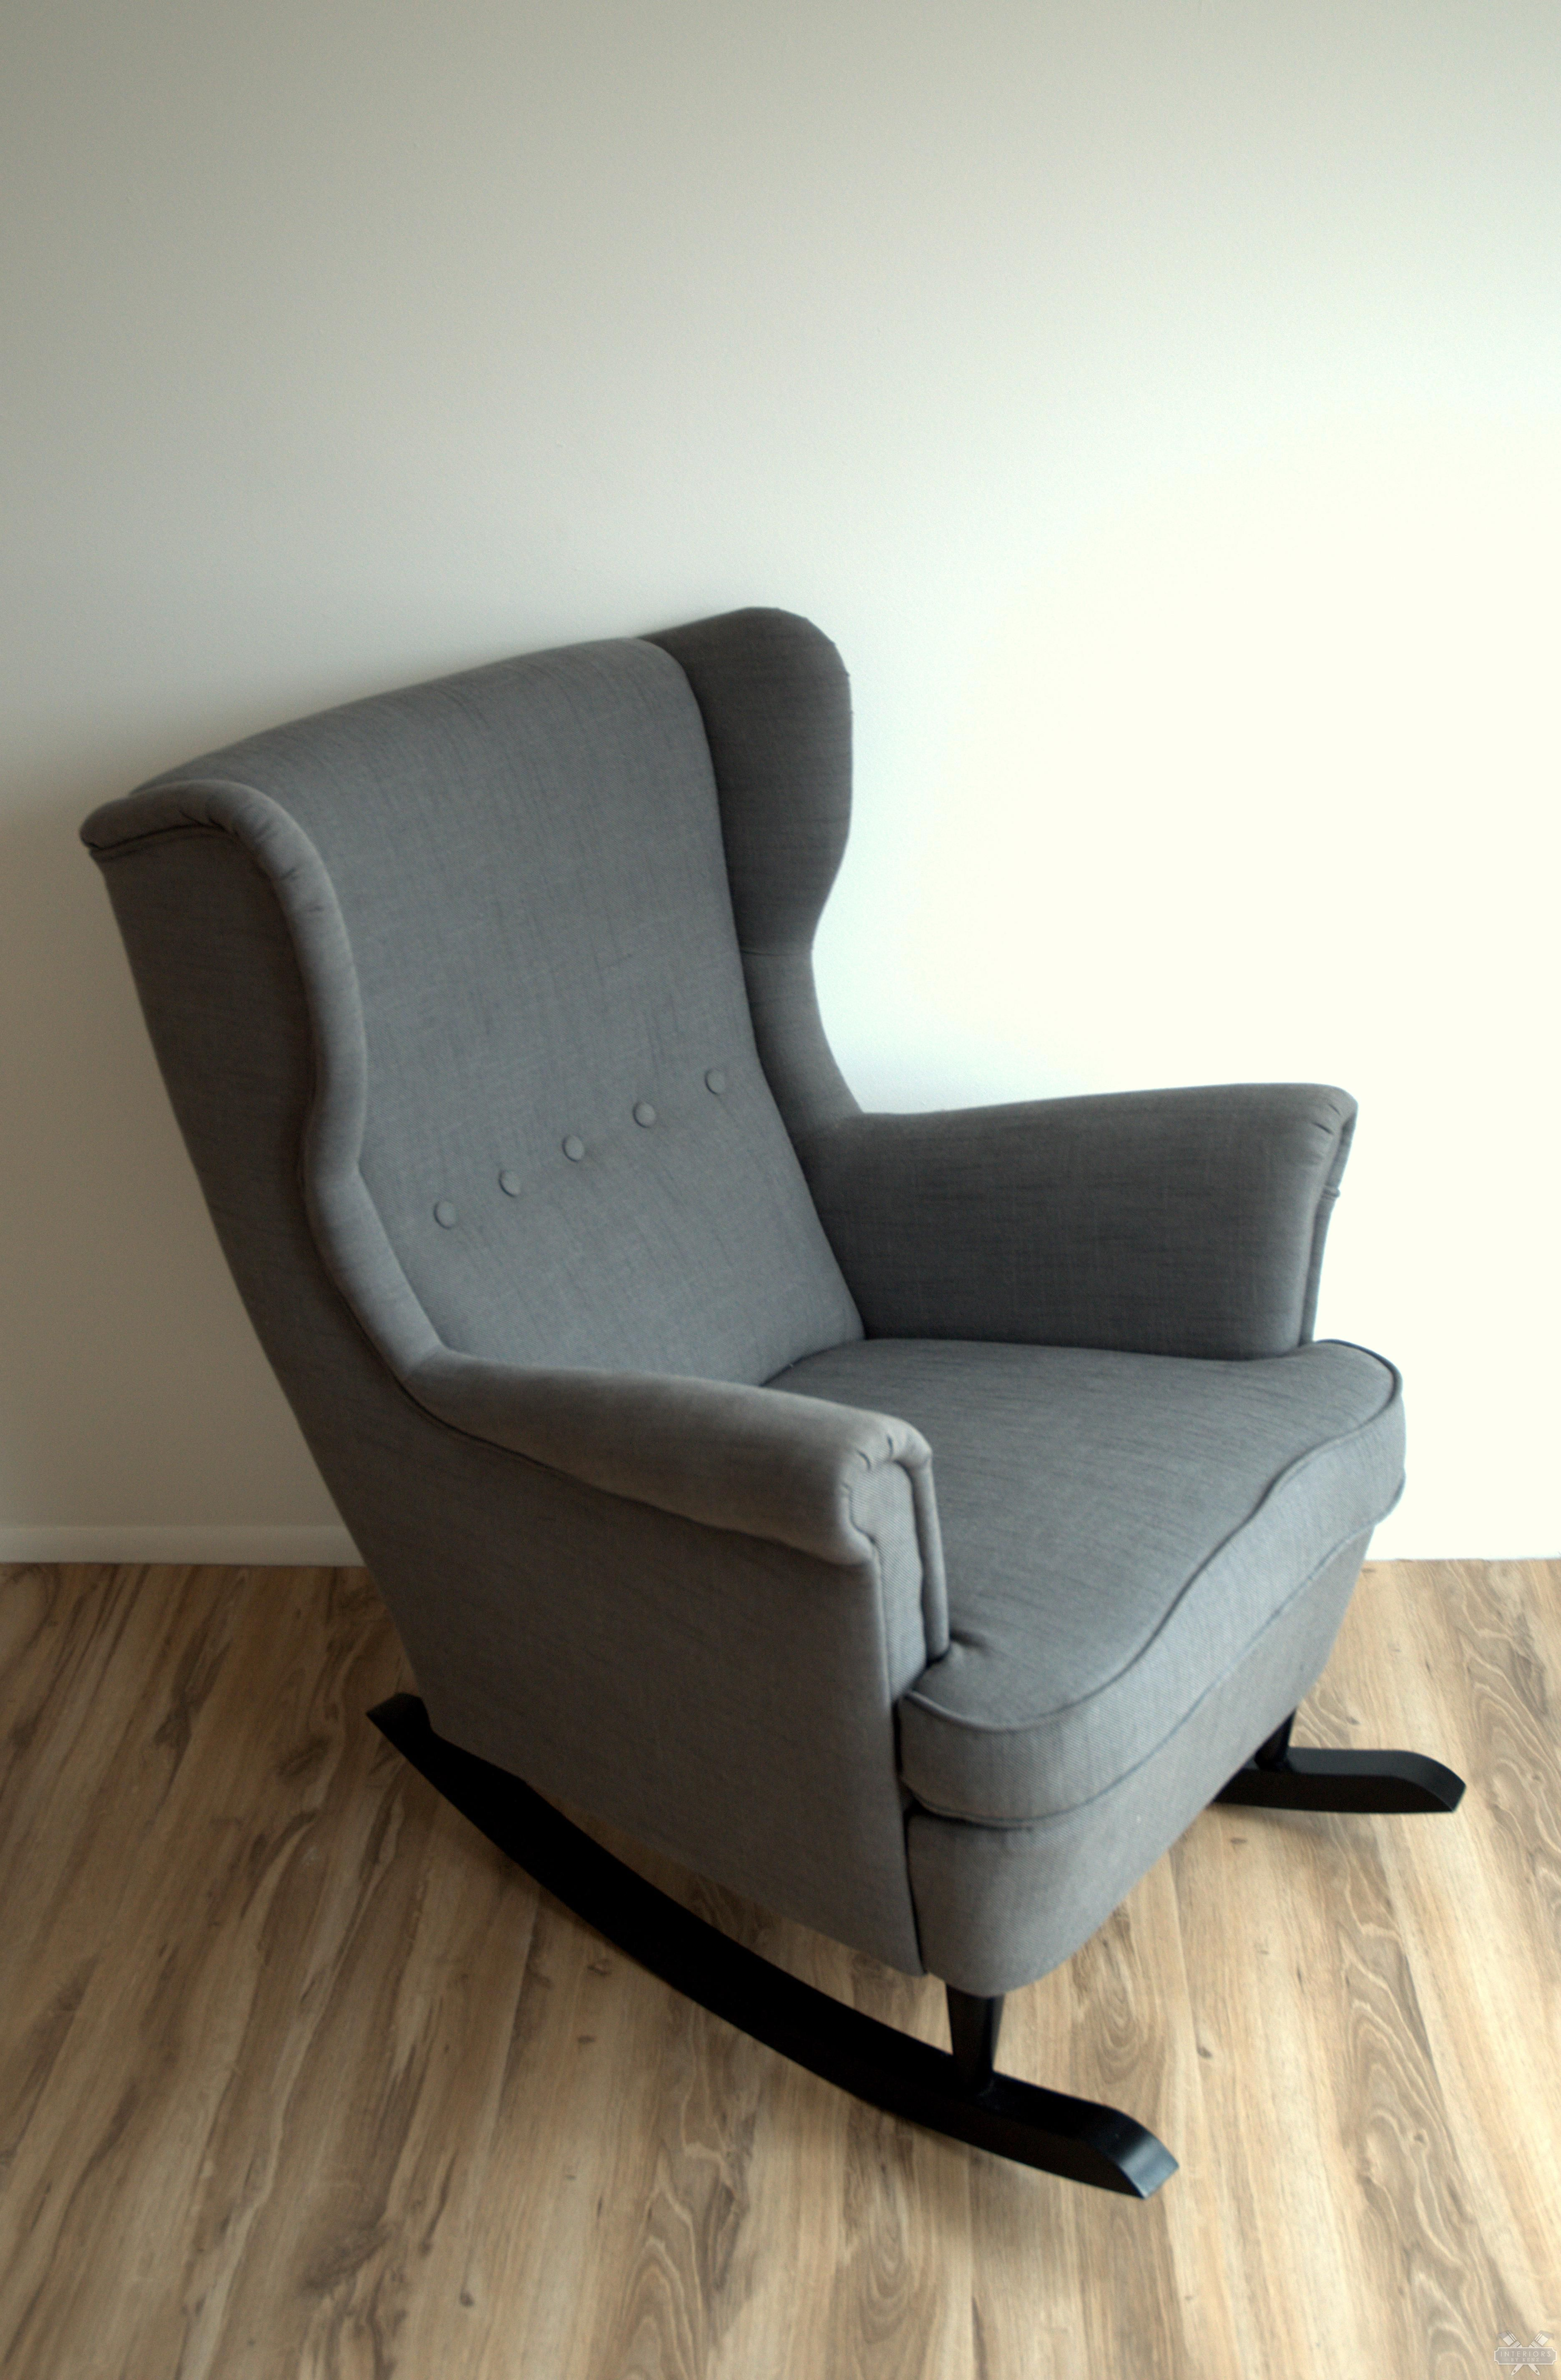 Strandmon Wing Chair Review Swing Seat Under Pergola Ikea Nursery Hack Thenurseries